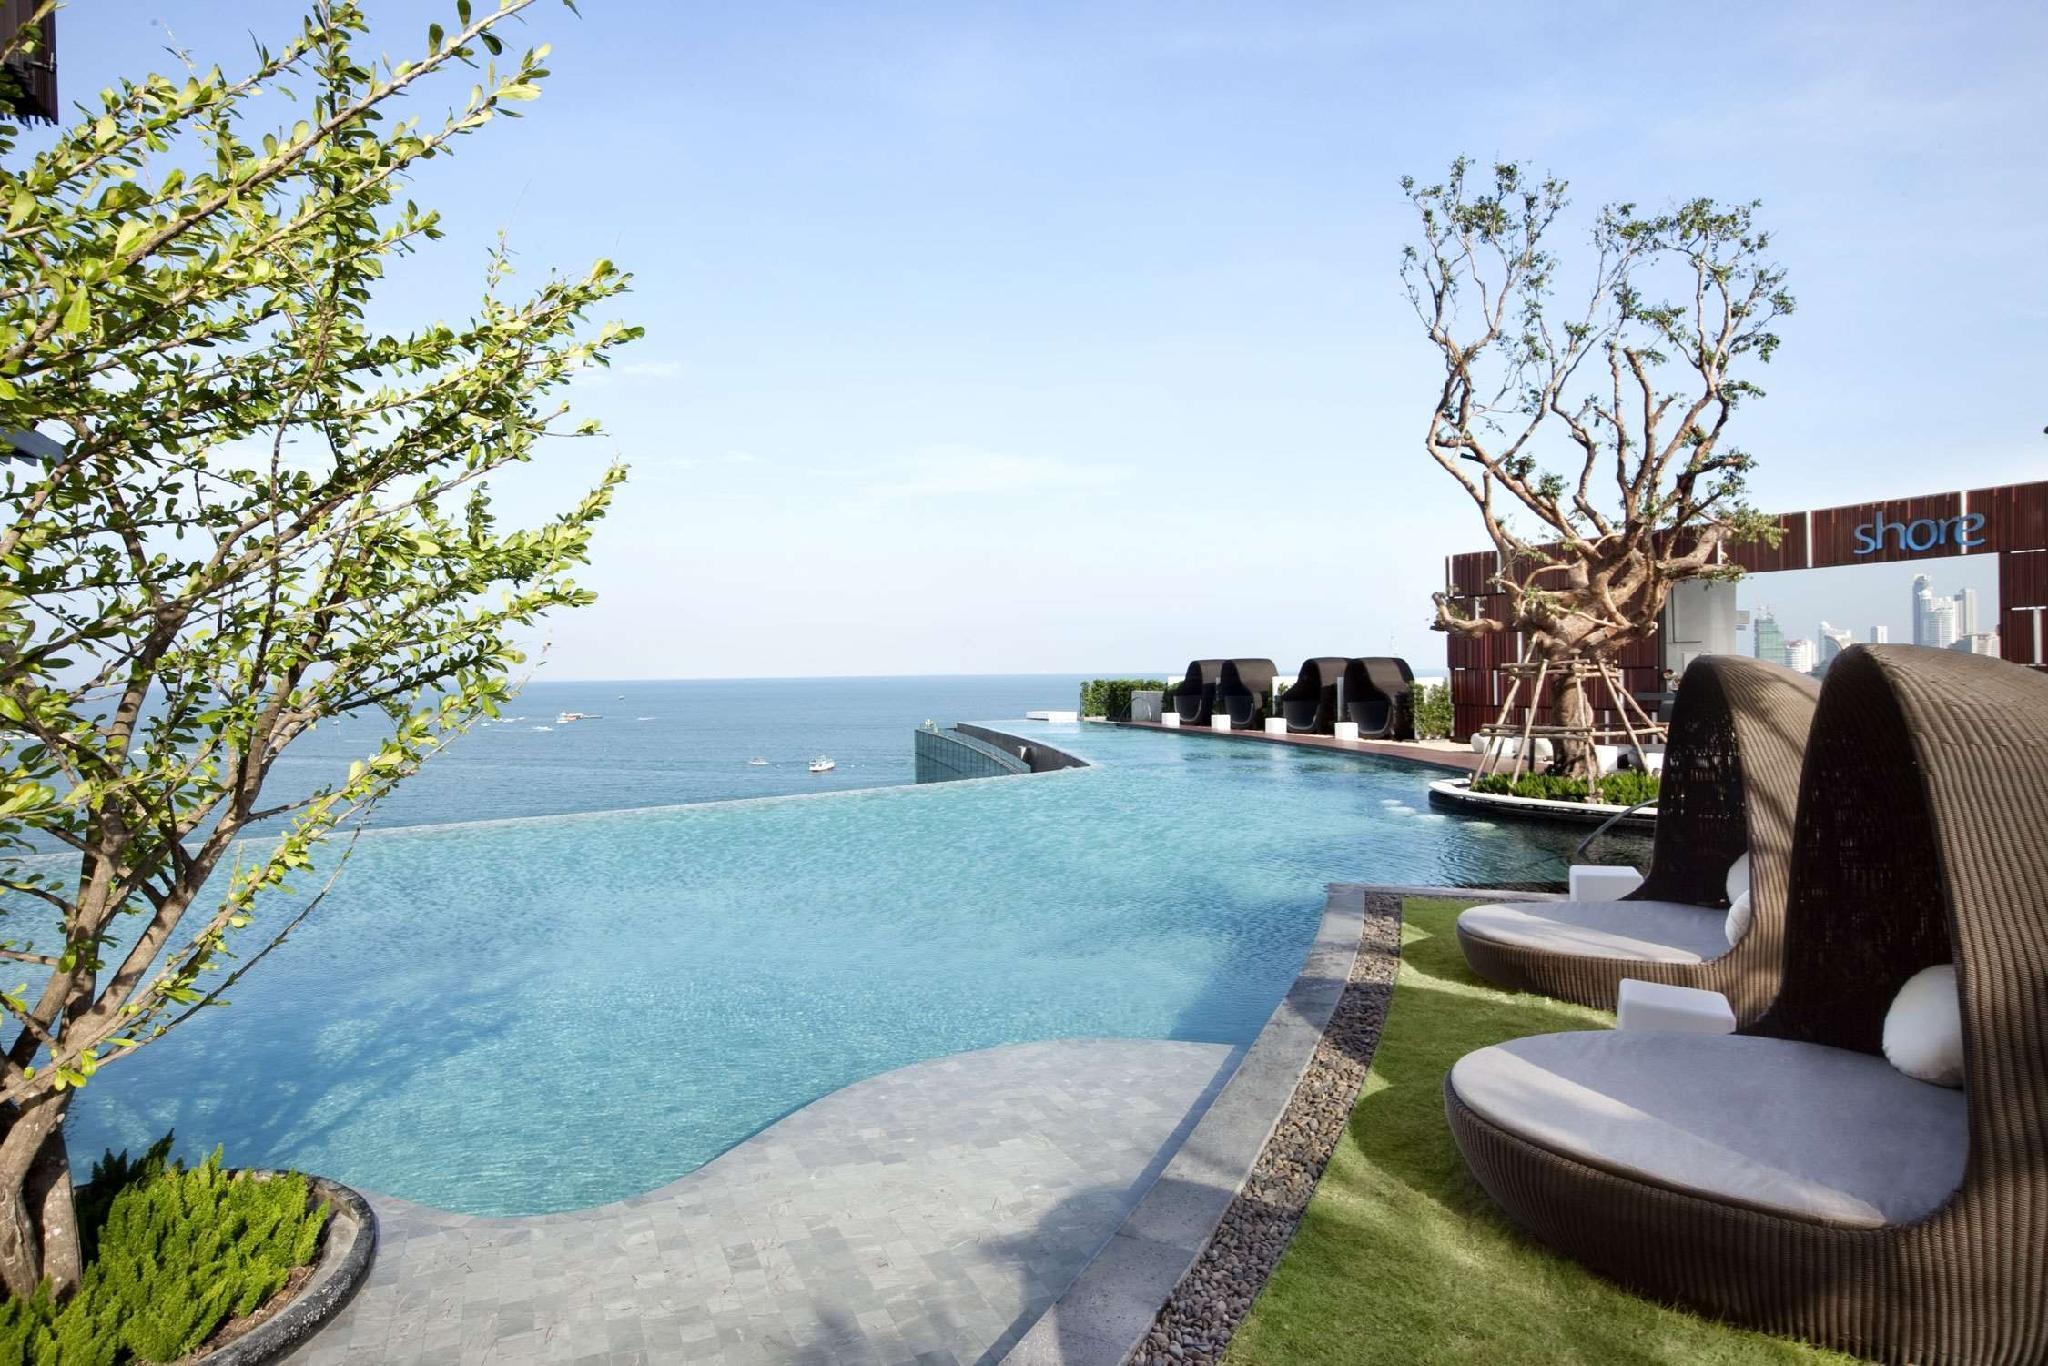 Hilton Pattaya ฮิลตัน พัทยา